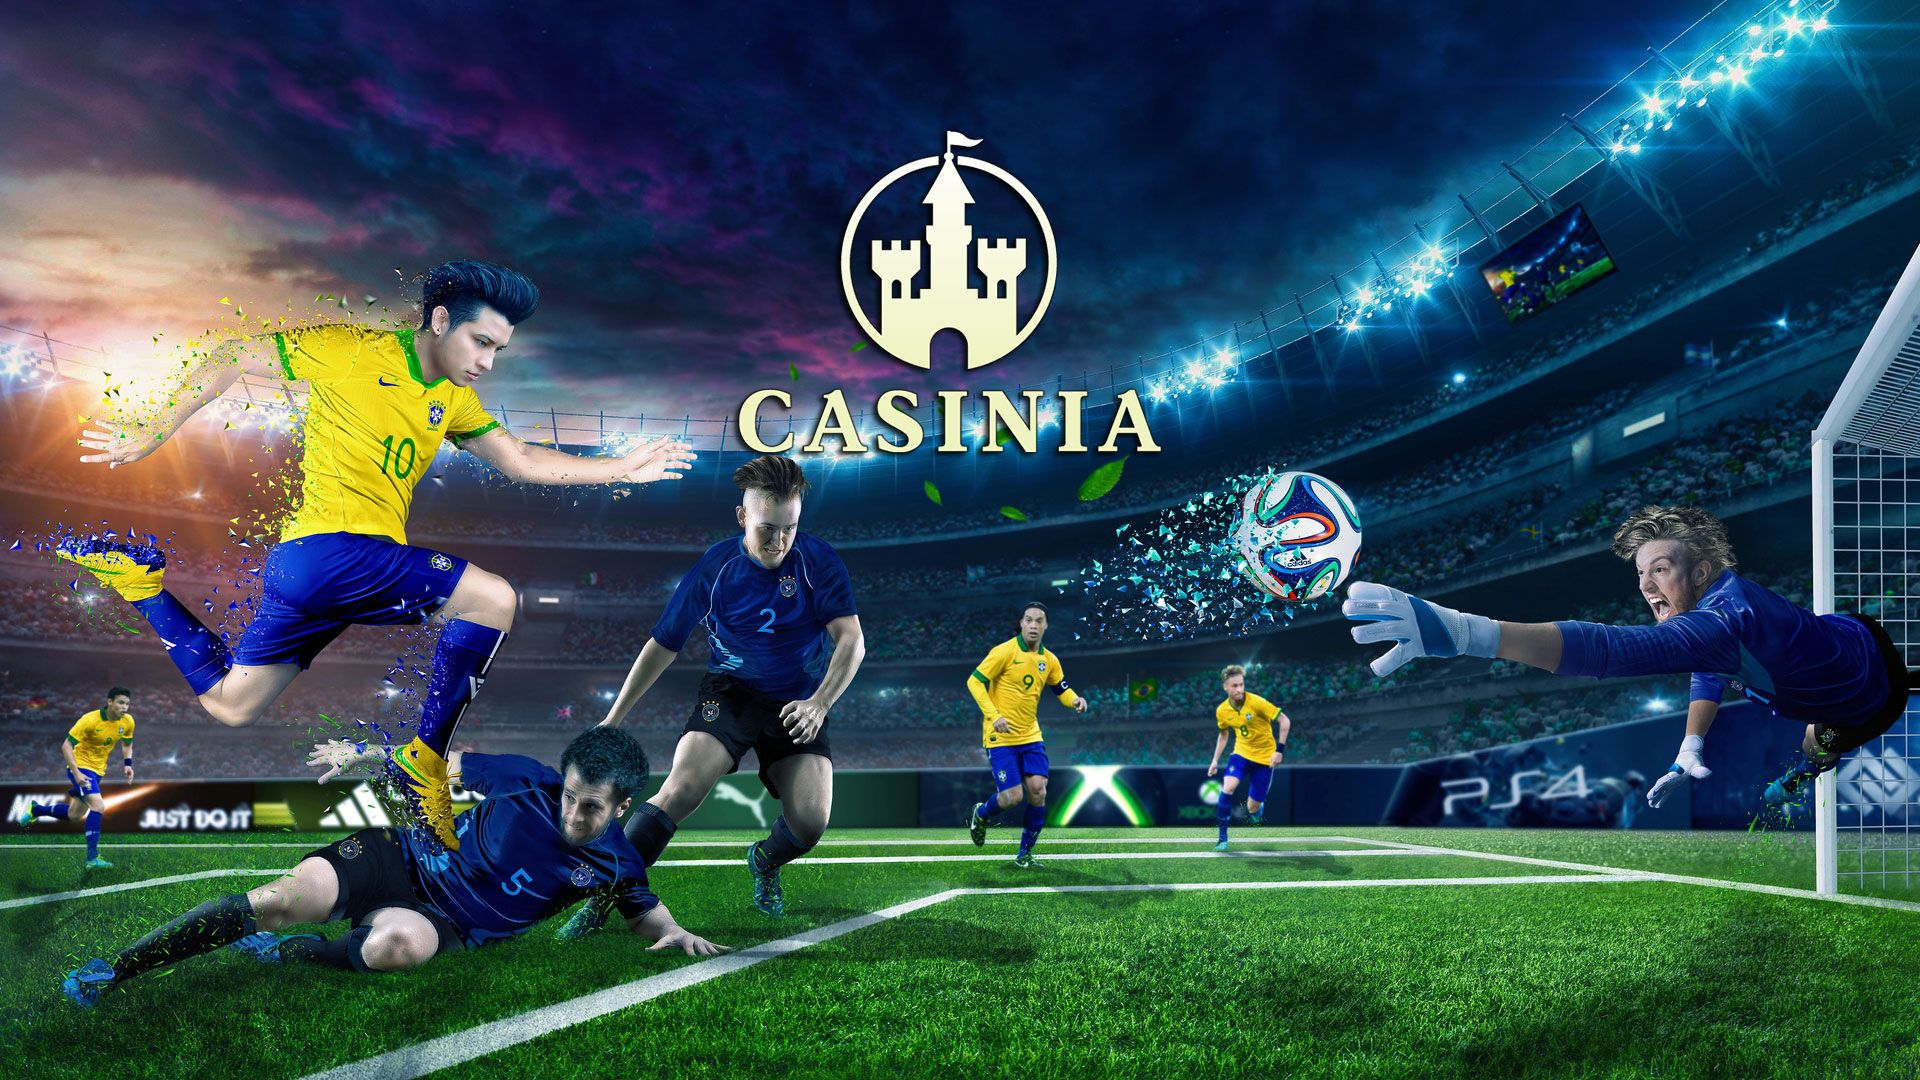 The Desktop Wallpapers Sports Soccer